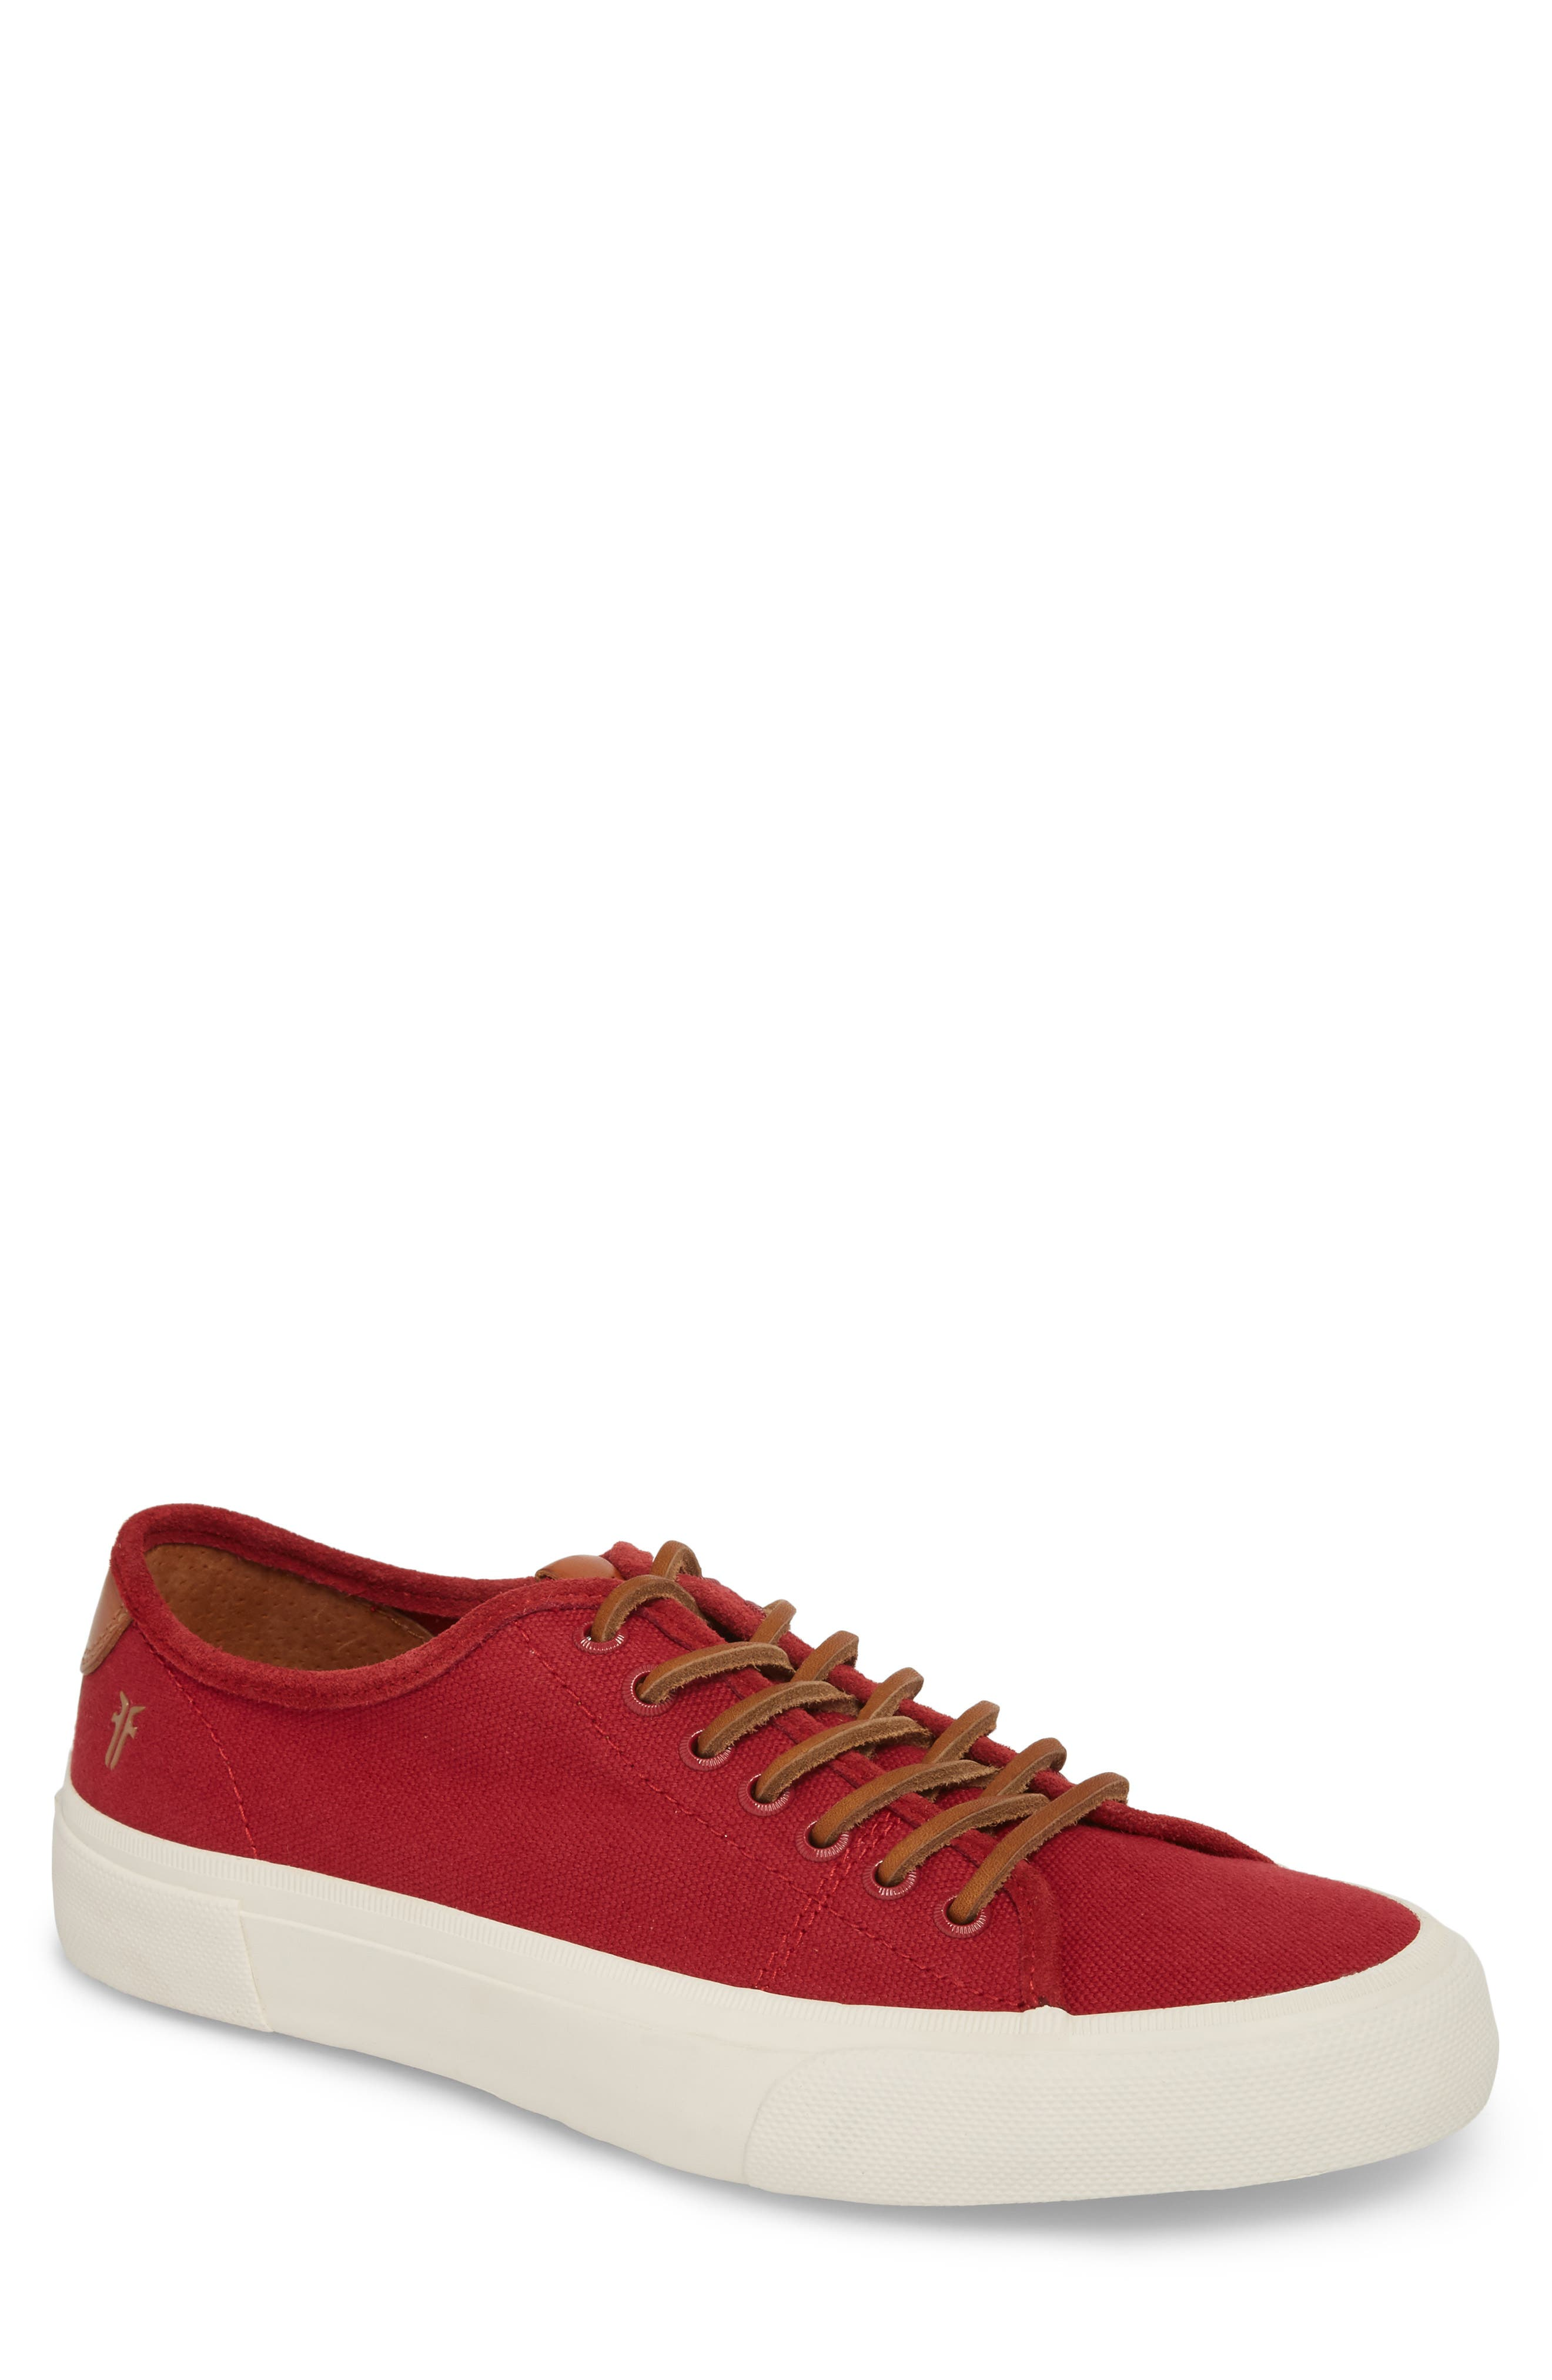 Main Image - Frye Ludlow Low Top Sneaker (Men)